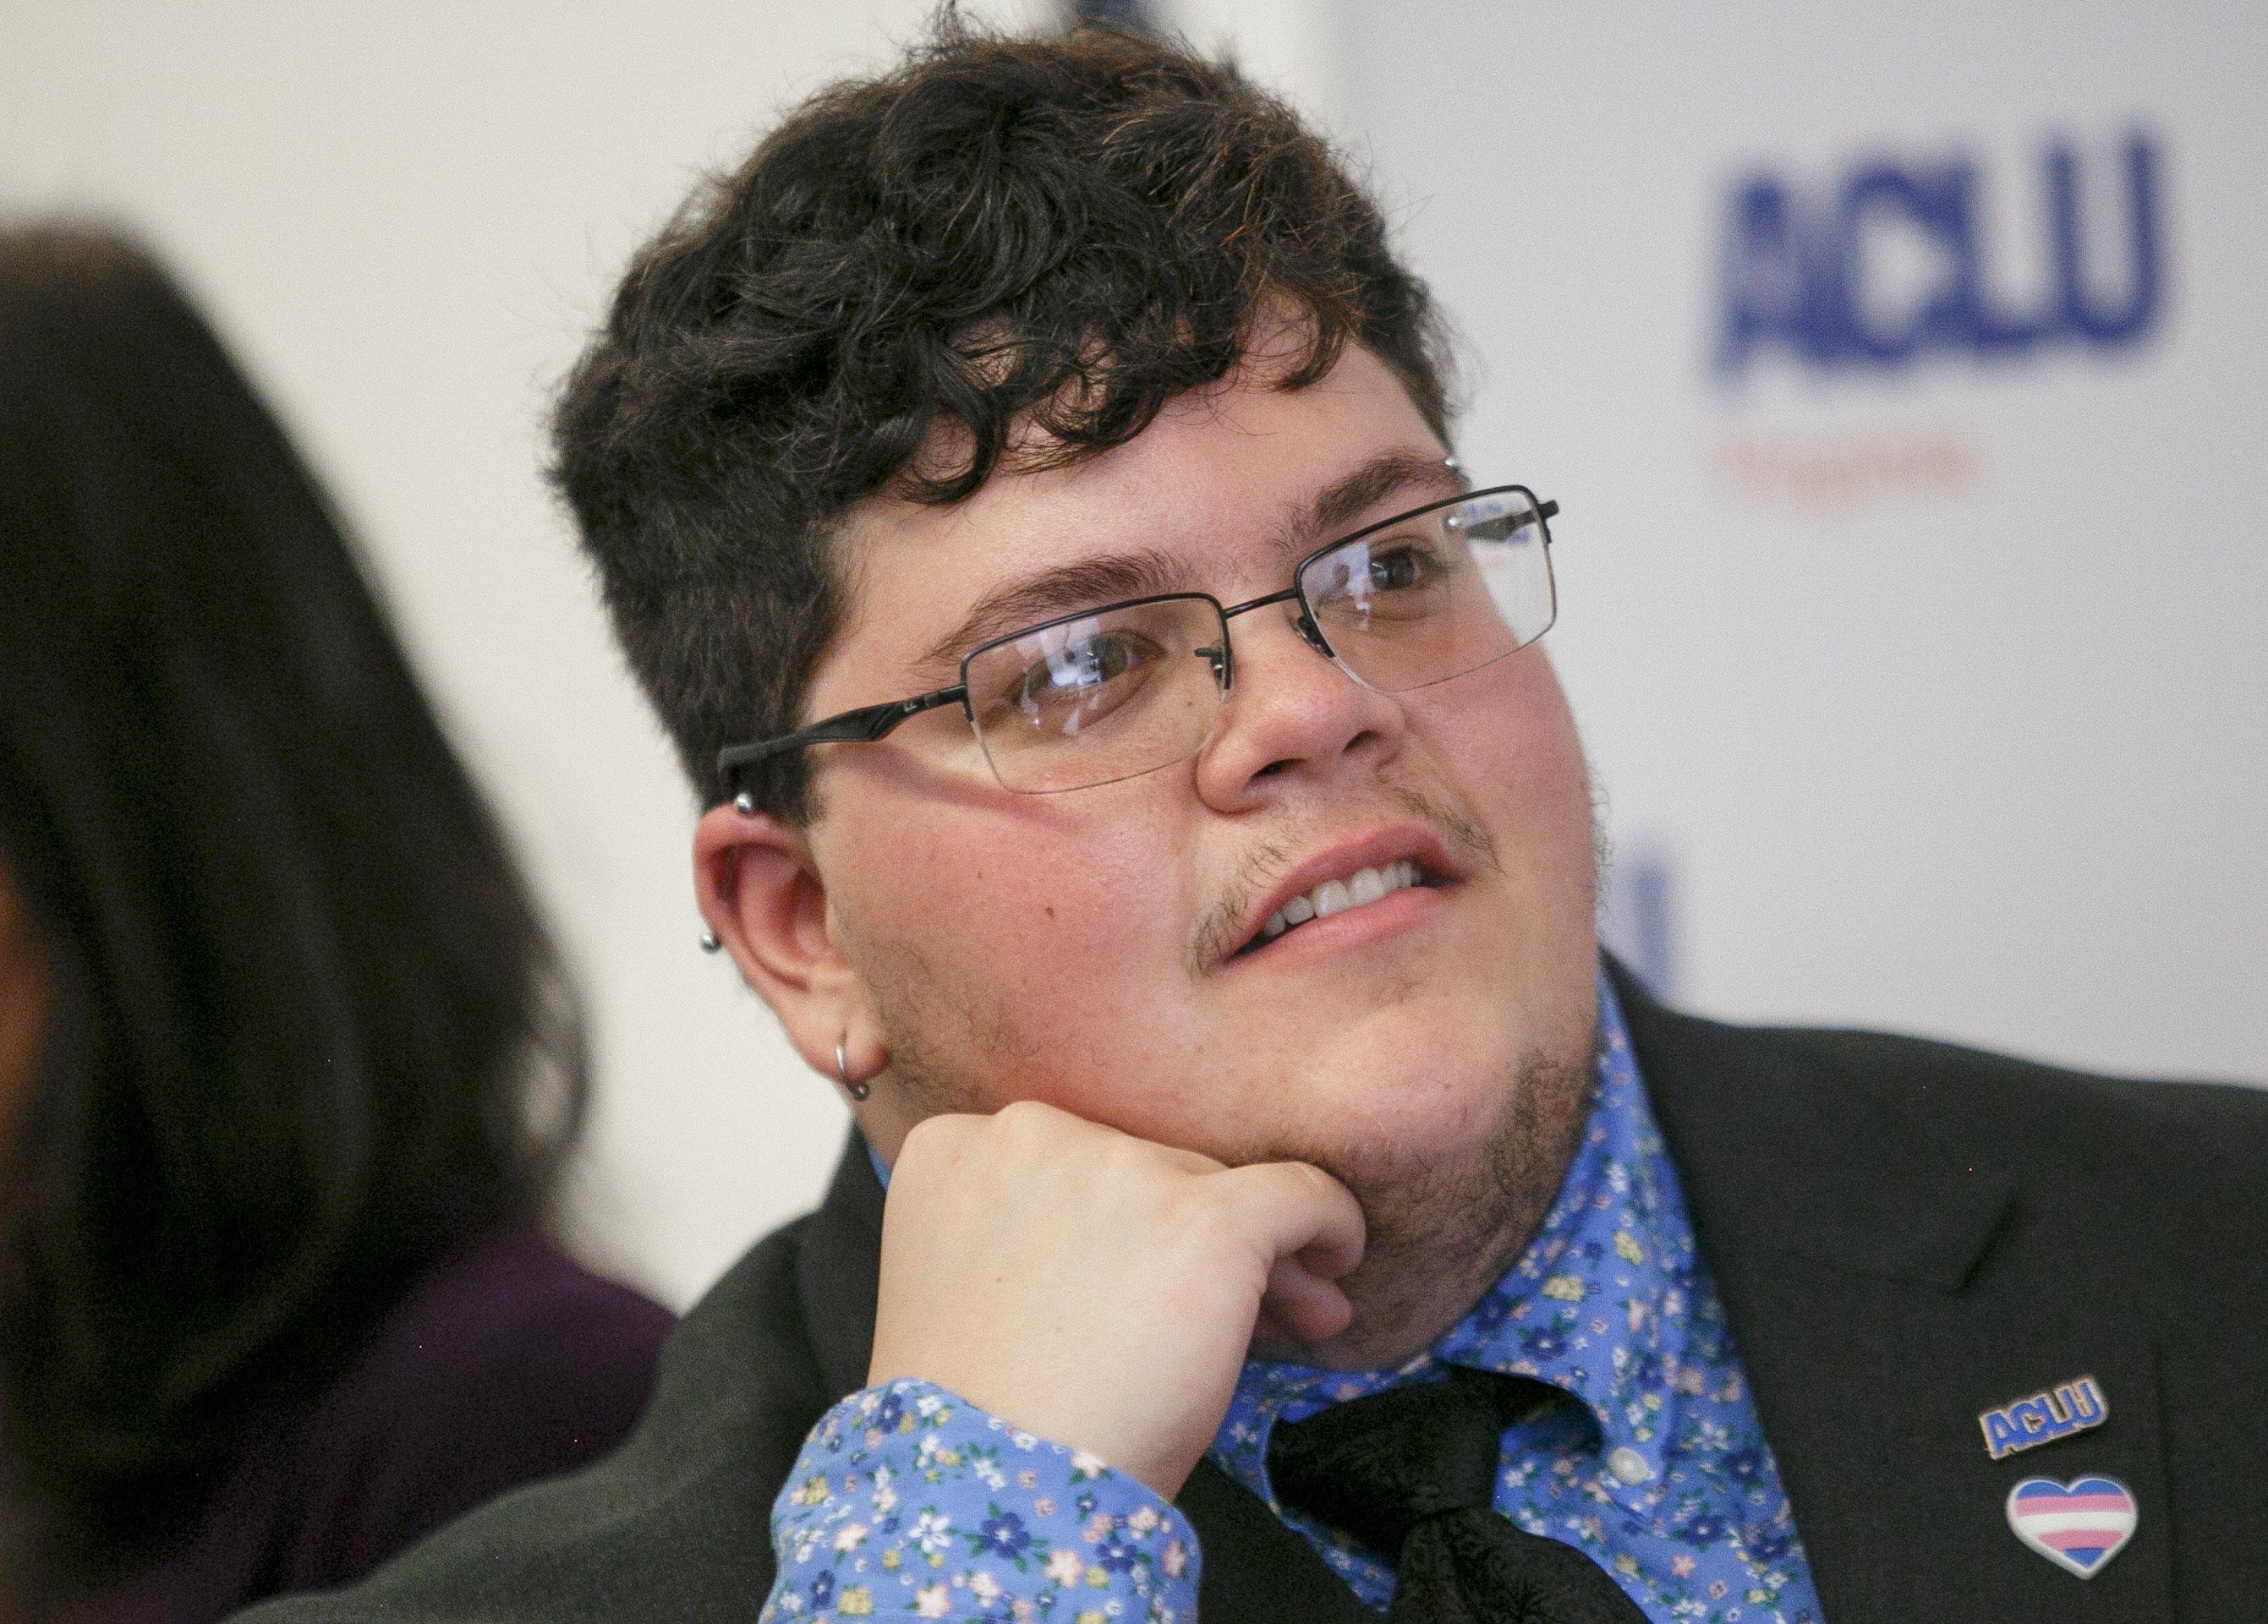 Virginia transgender bathroom case: Judge favors ex-student